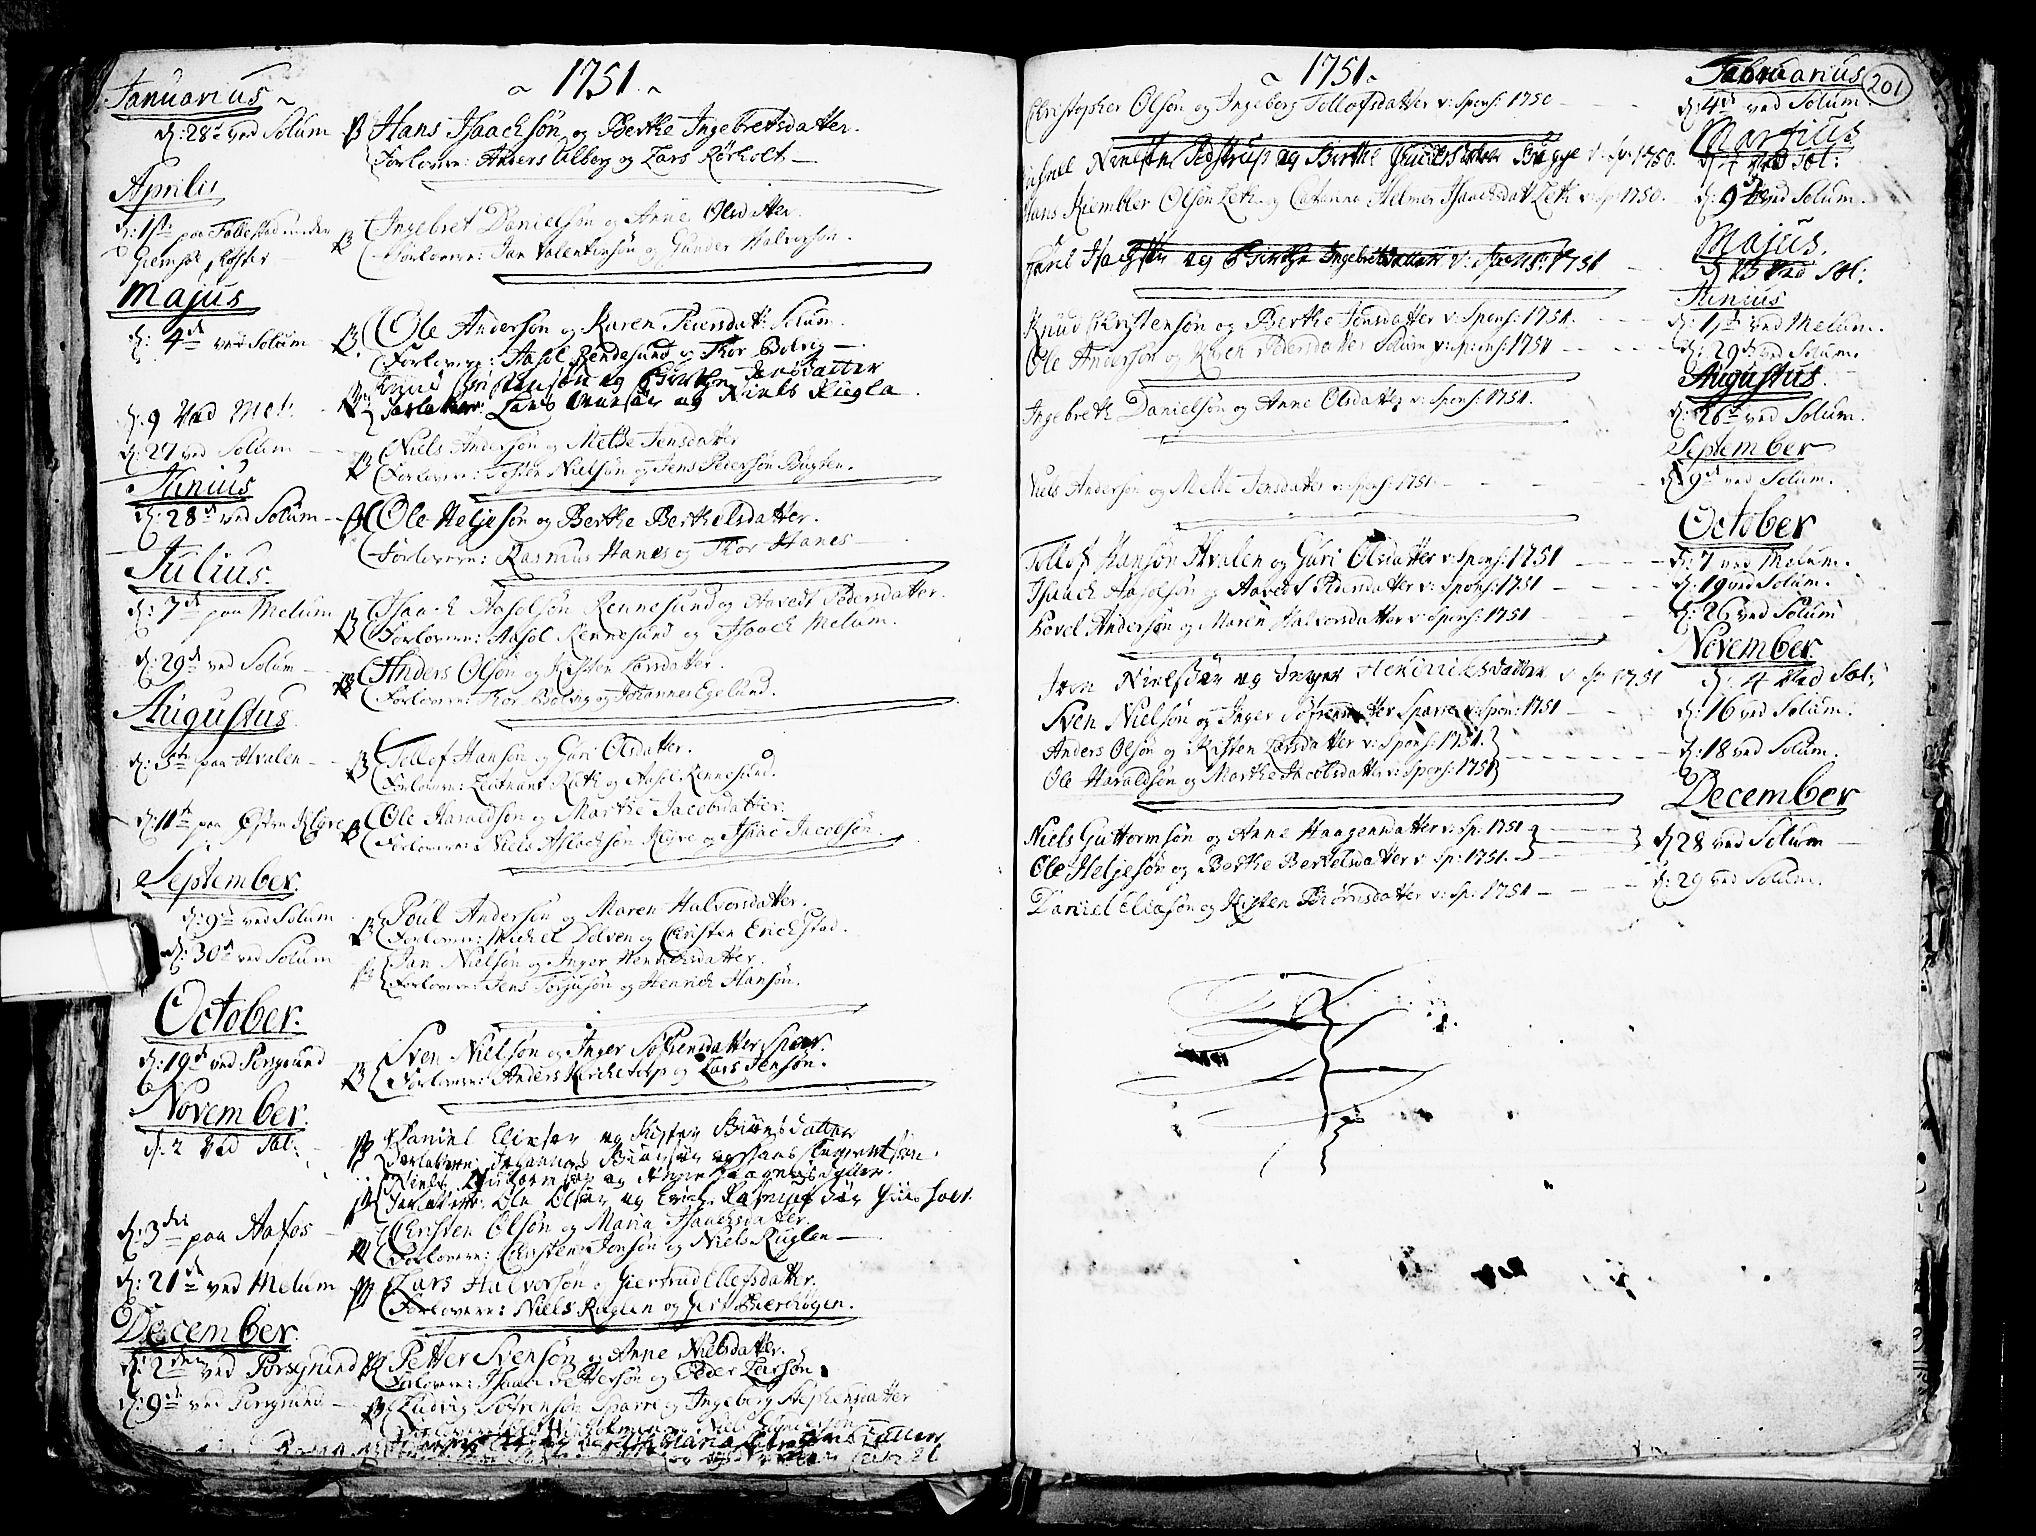 SAKO, Solum kirkebøker, F/Fa/L0002: Ministerialbok nr. I 2, 1713-1761, s. 201